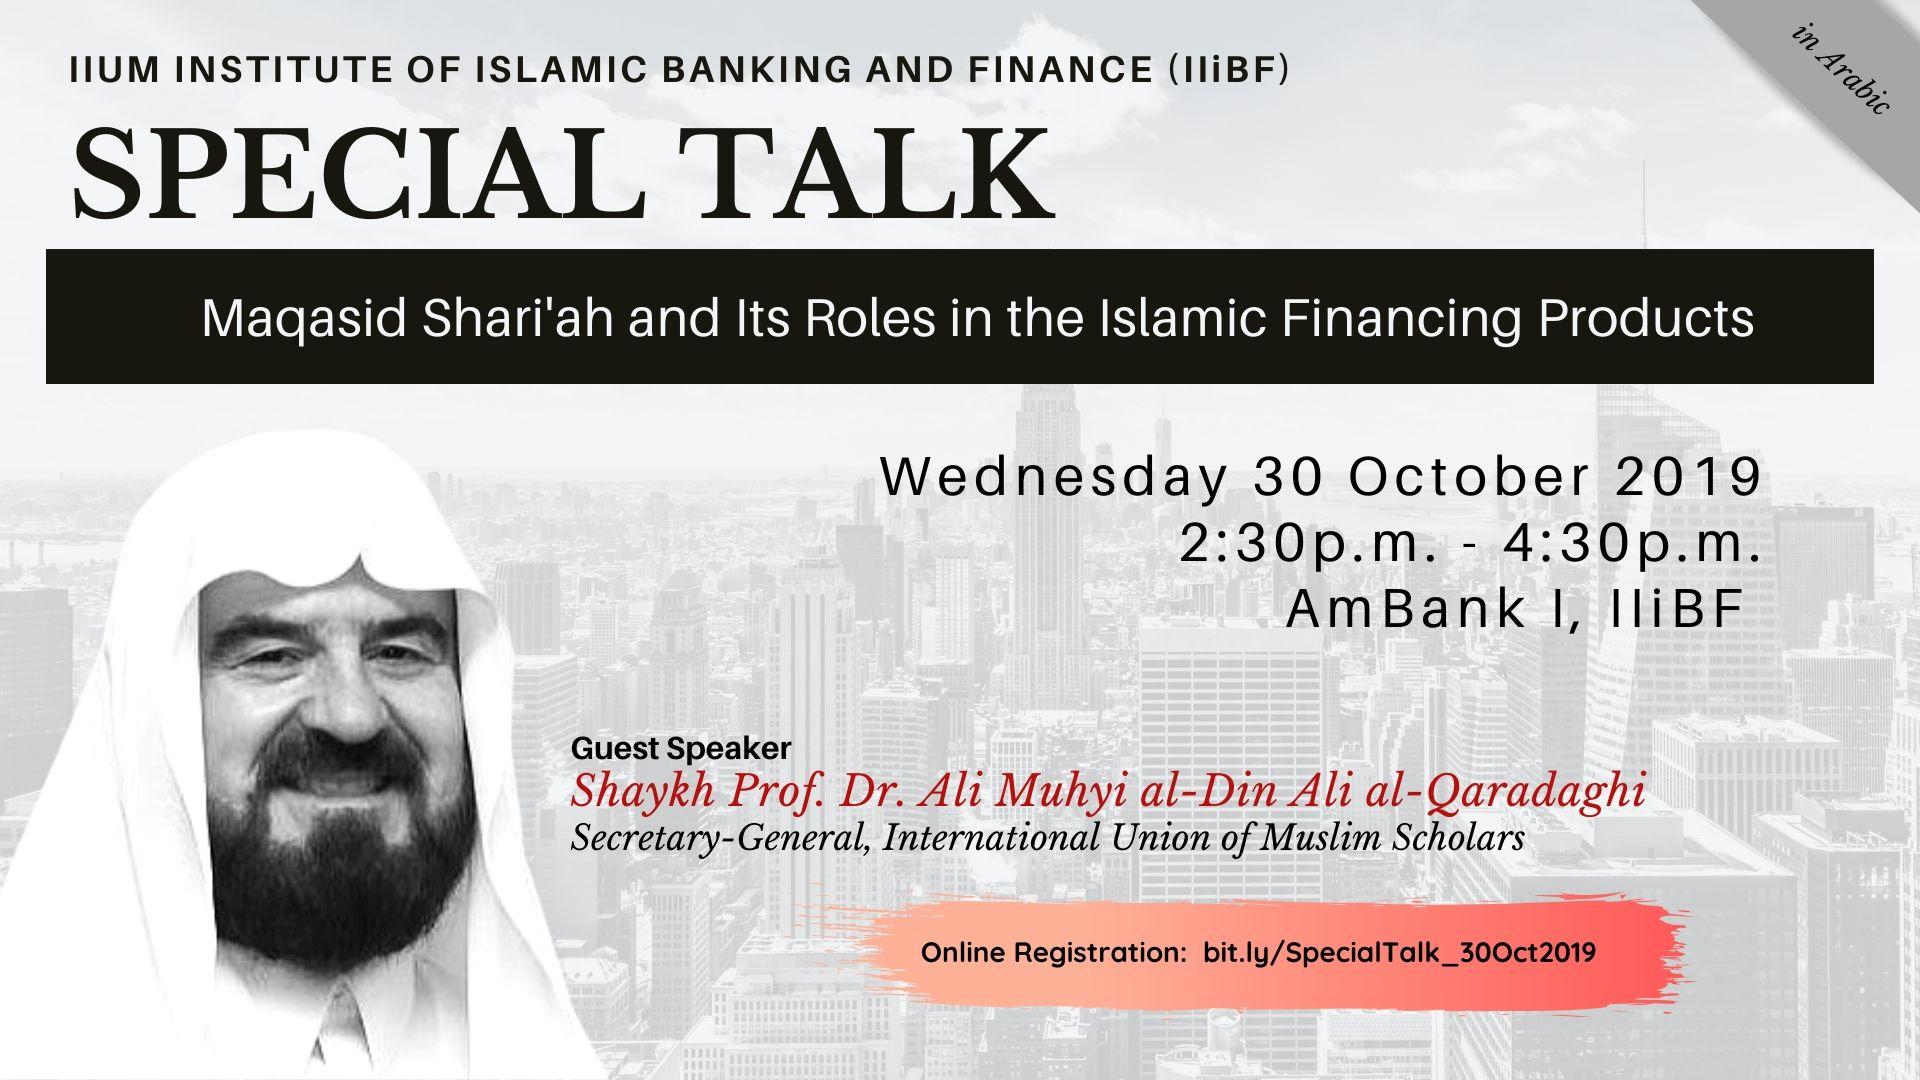 Special Talk Series 2019 - Shaykh Prof. Dr. Ali Muhyi al-Din Ali al-Qaradaghi